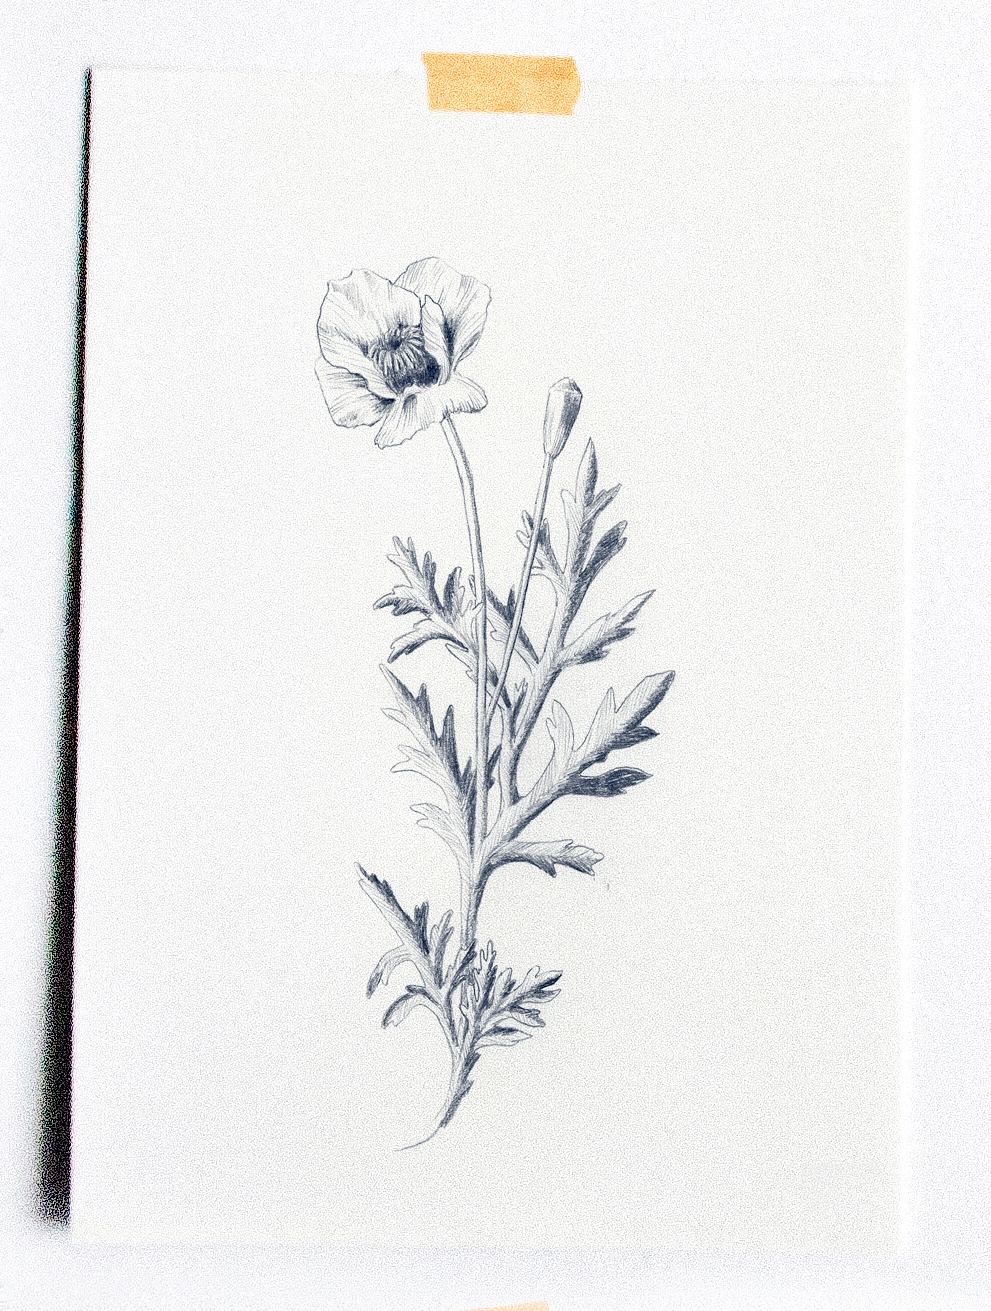 fig. 3. Poppy flower